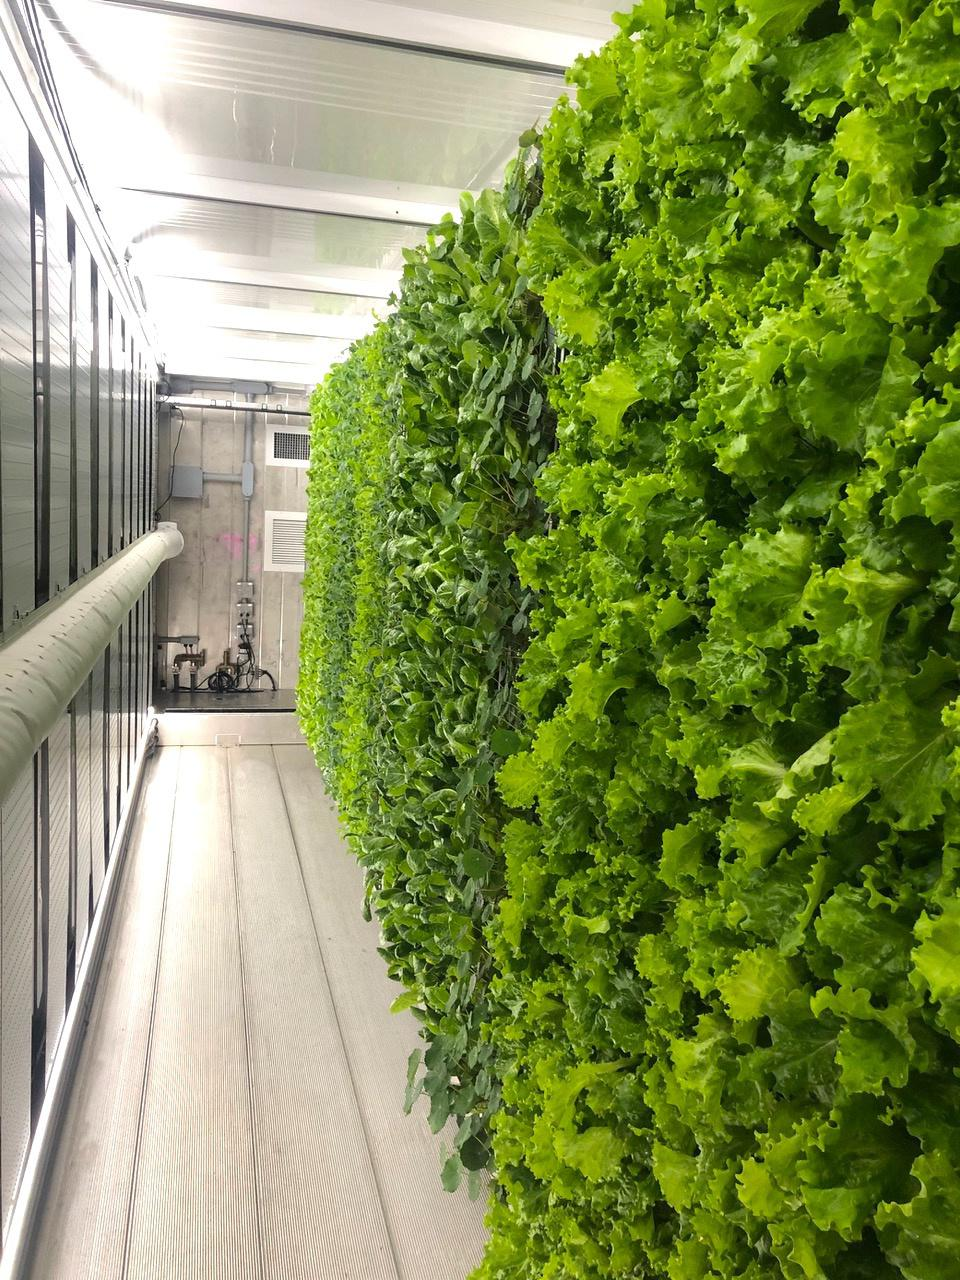 REEF tech miami vertical farming container housing